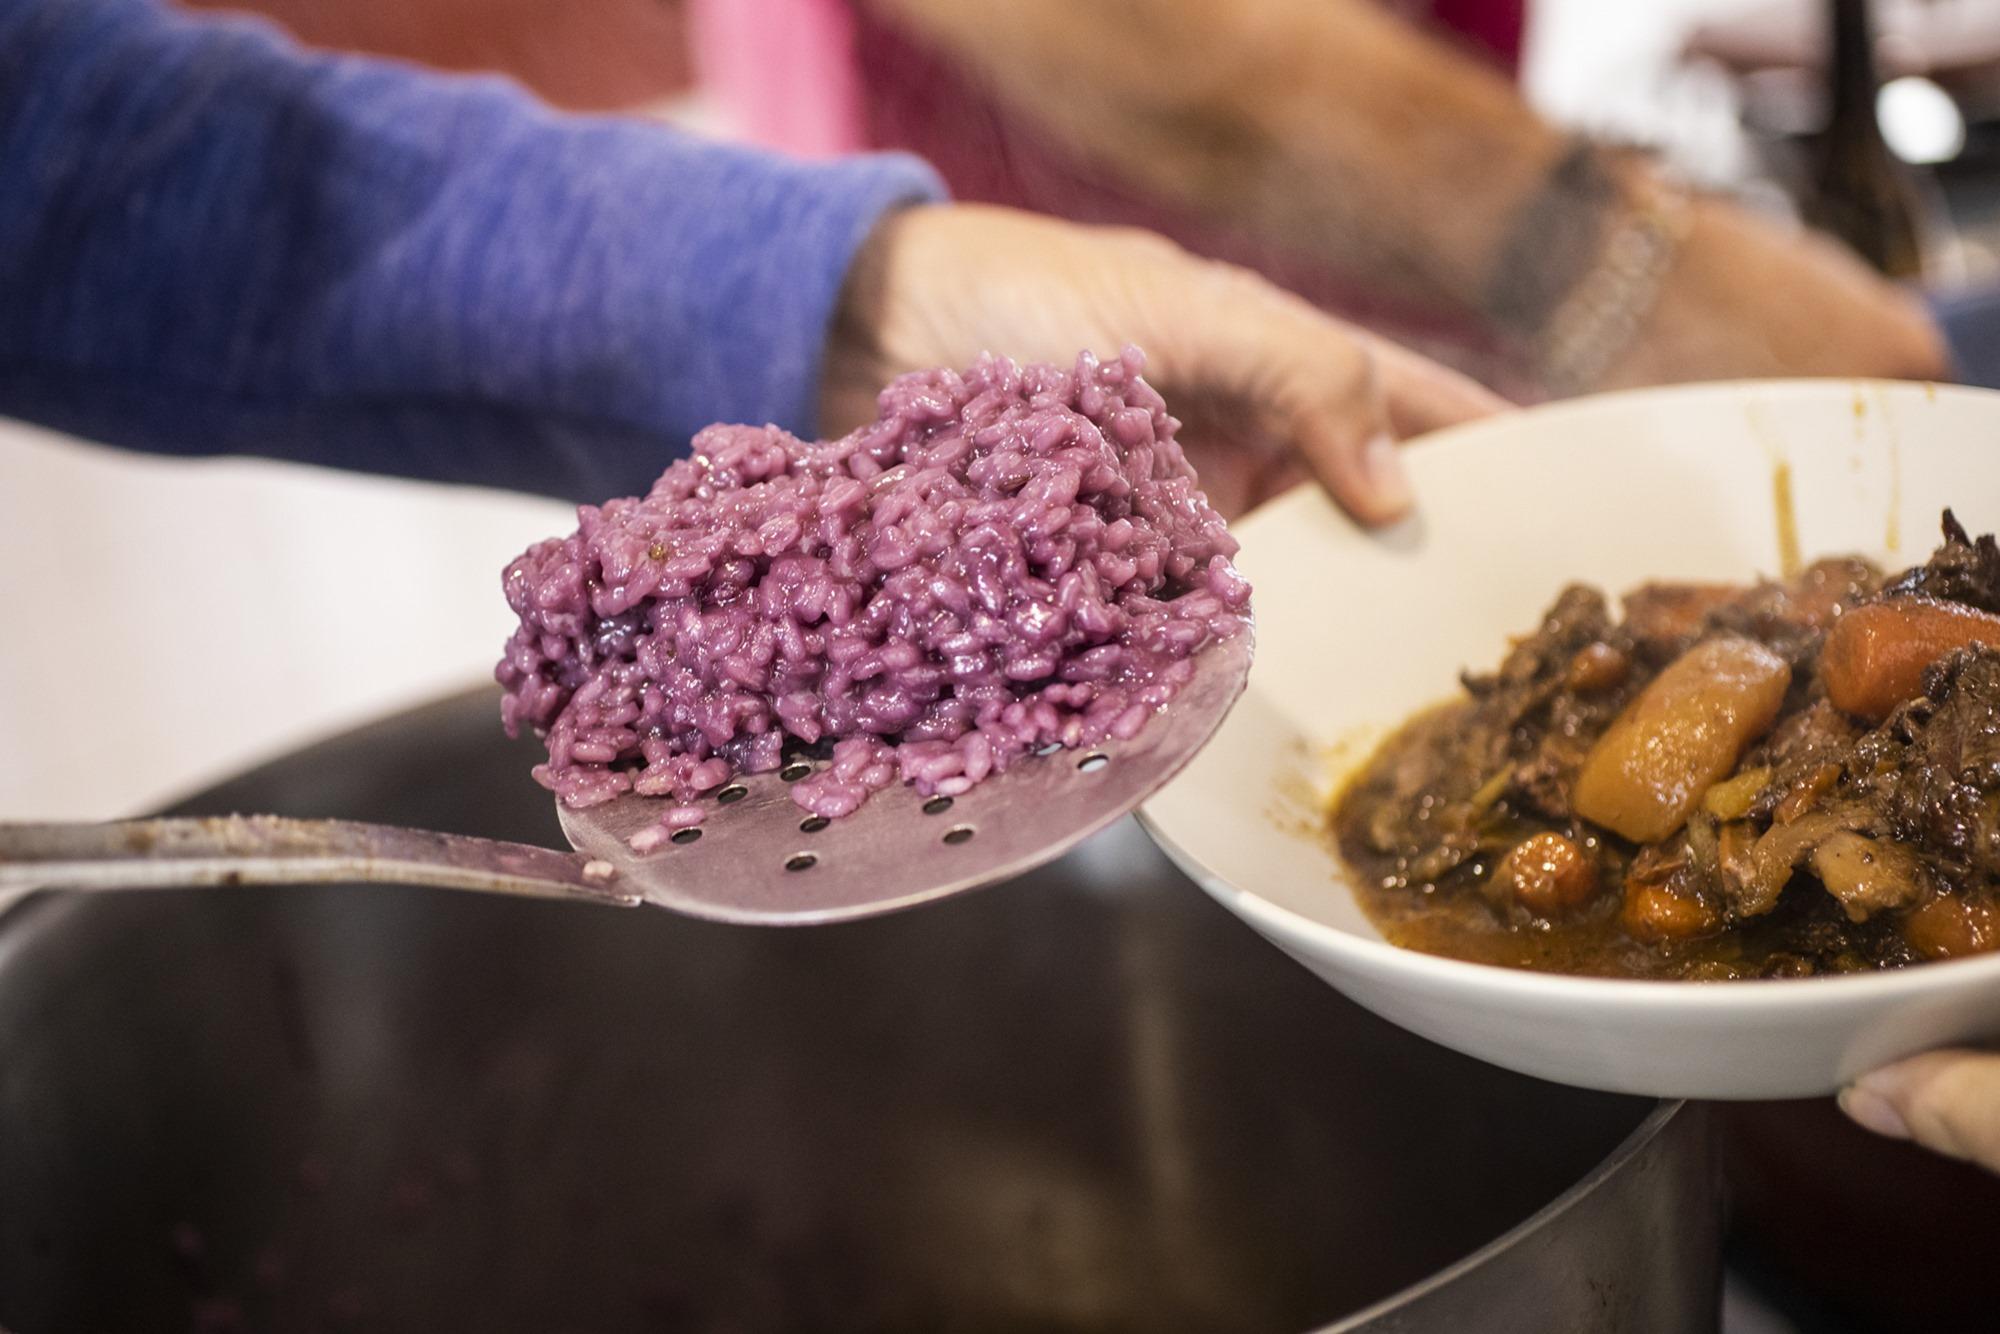 El menú: guiso de jabalí y arroz púrpura.